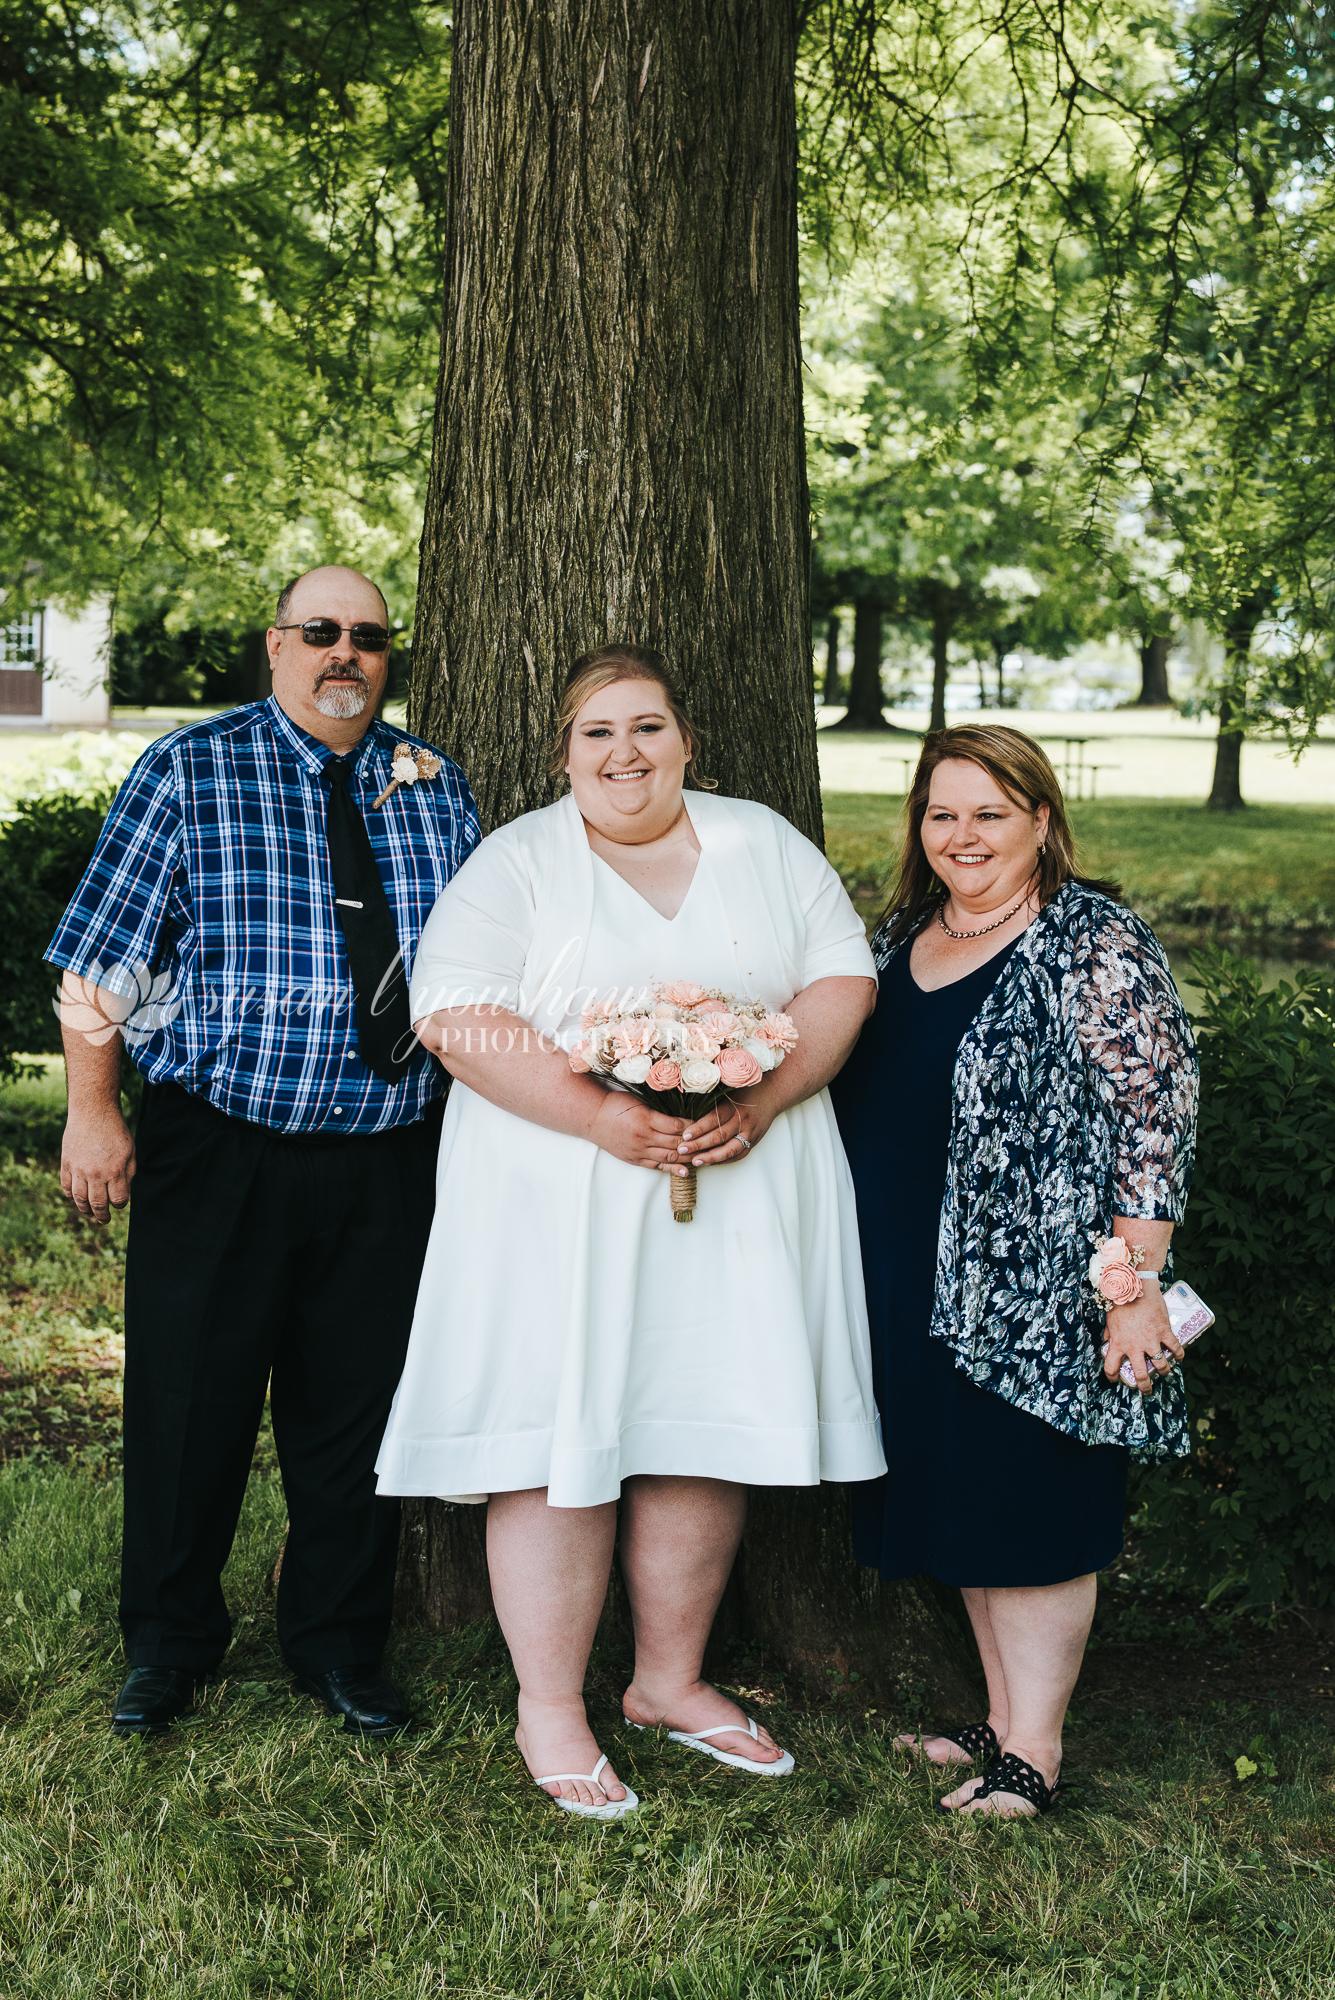 Bill and Sarah Wedding Photos 06-08-2019 SLY Photography -52.jpg